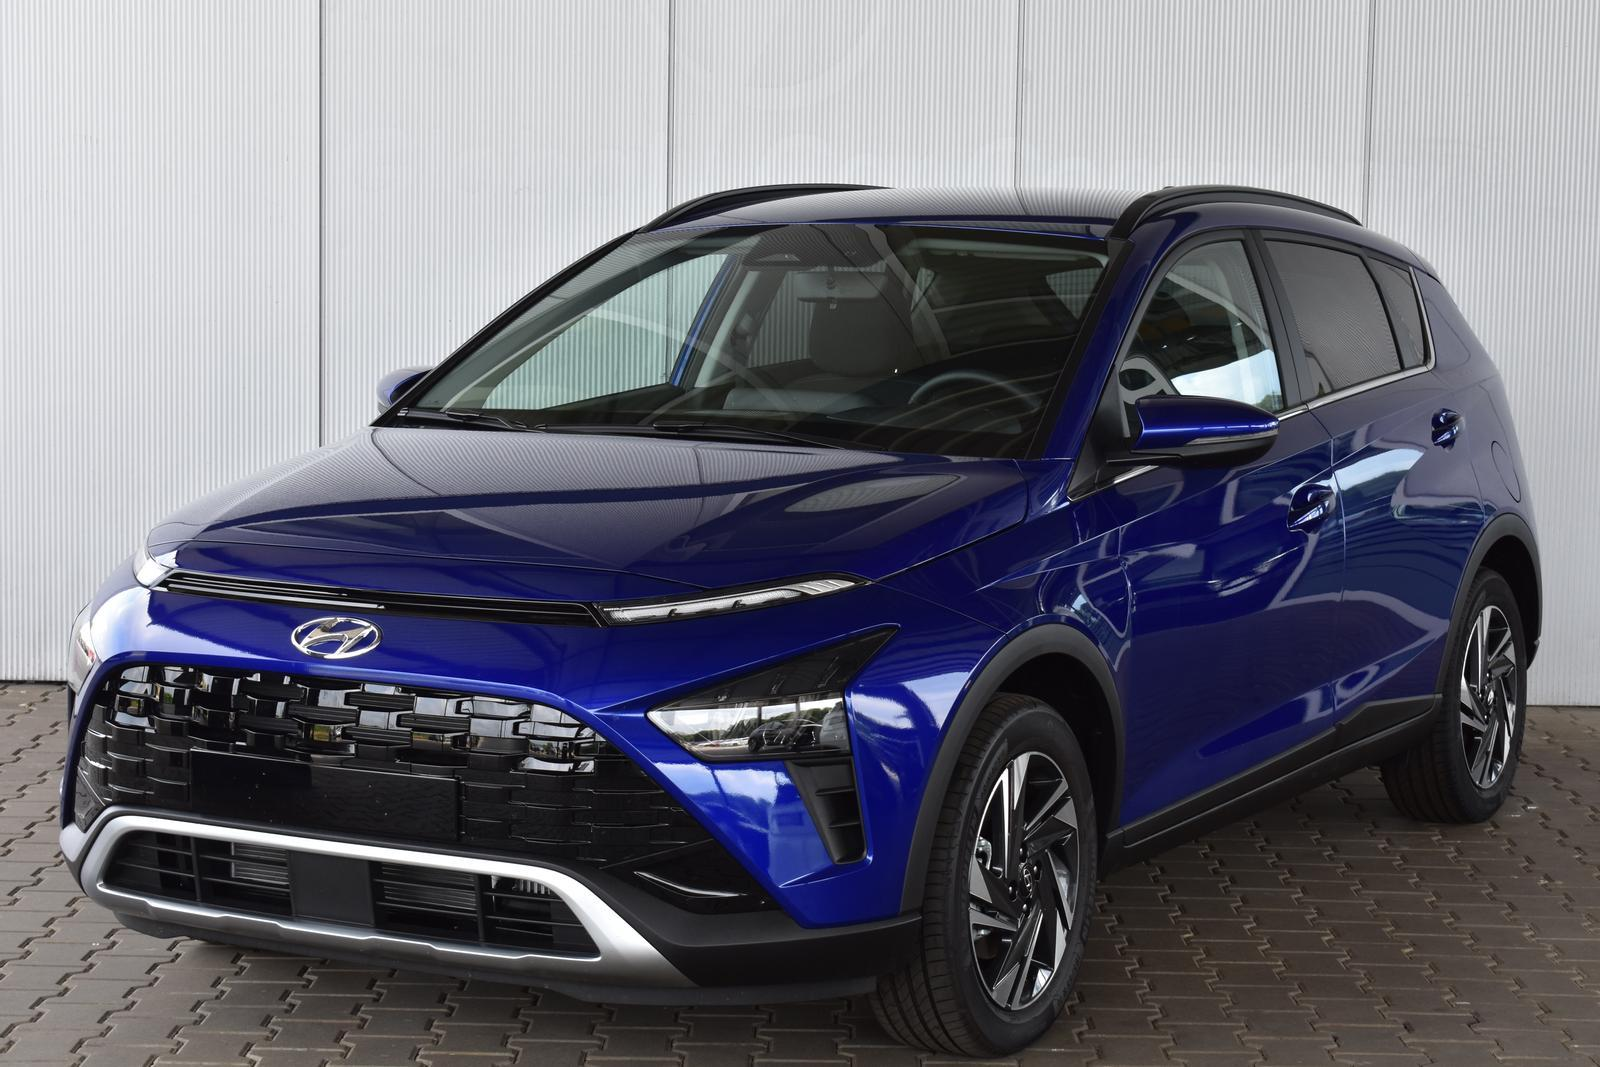 Hyundai Bayon 1.0 DESIGN COOL DCT AUTOM*VIRTUAL COCKPIT*CAR-PLAY